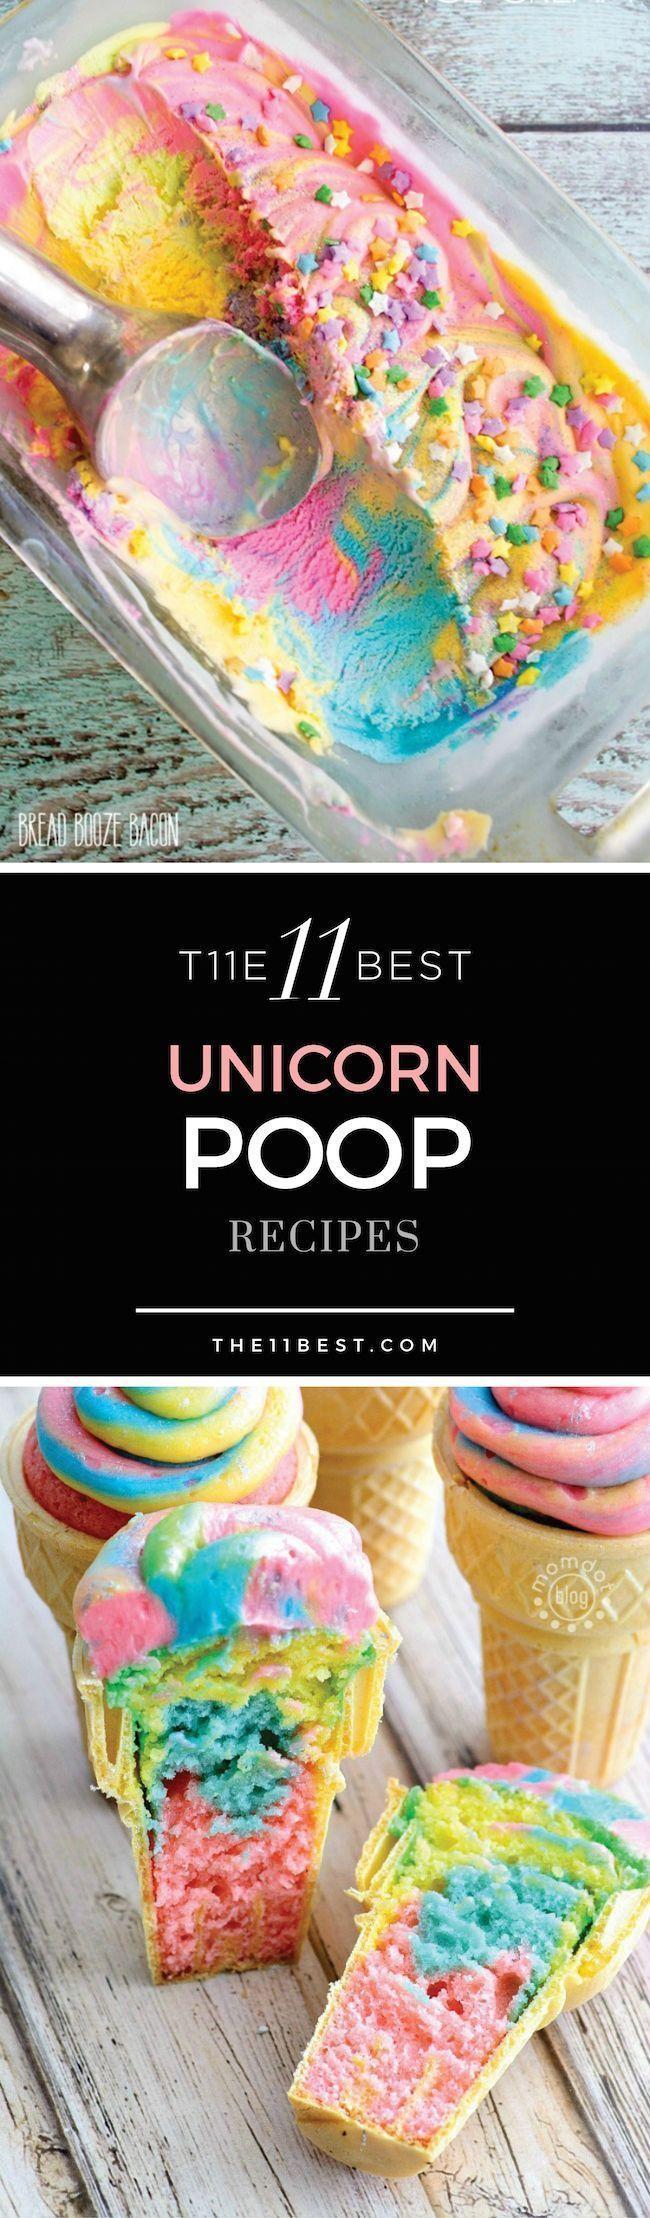 The 11 Best Unicorn Poop Recipes